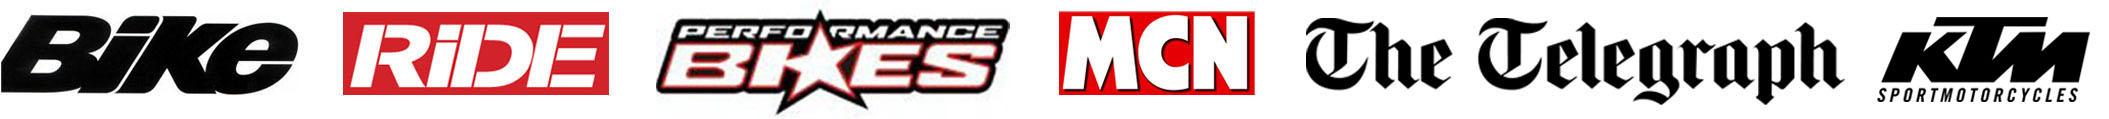 rapid_magazine logos_strip_V2.jpg